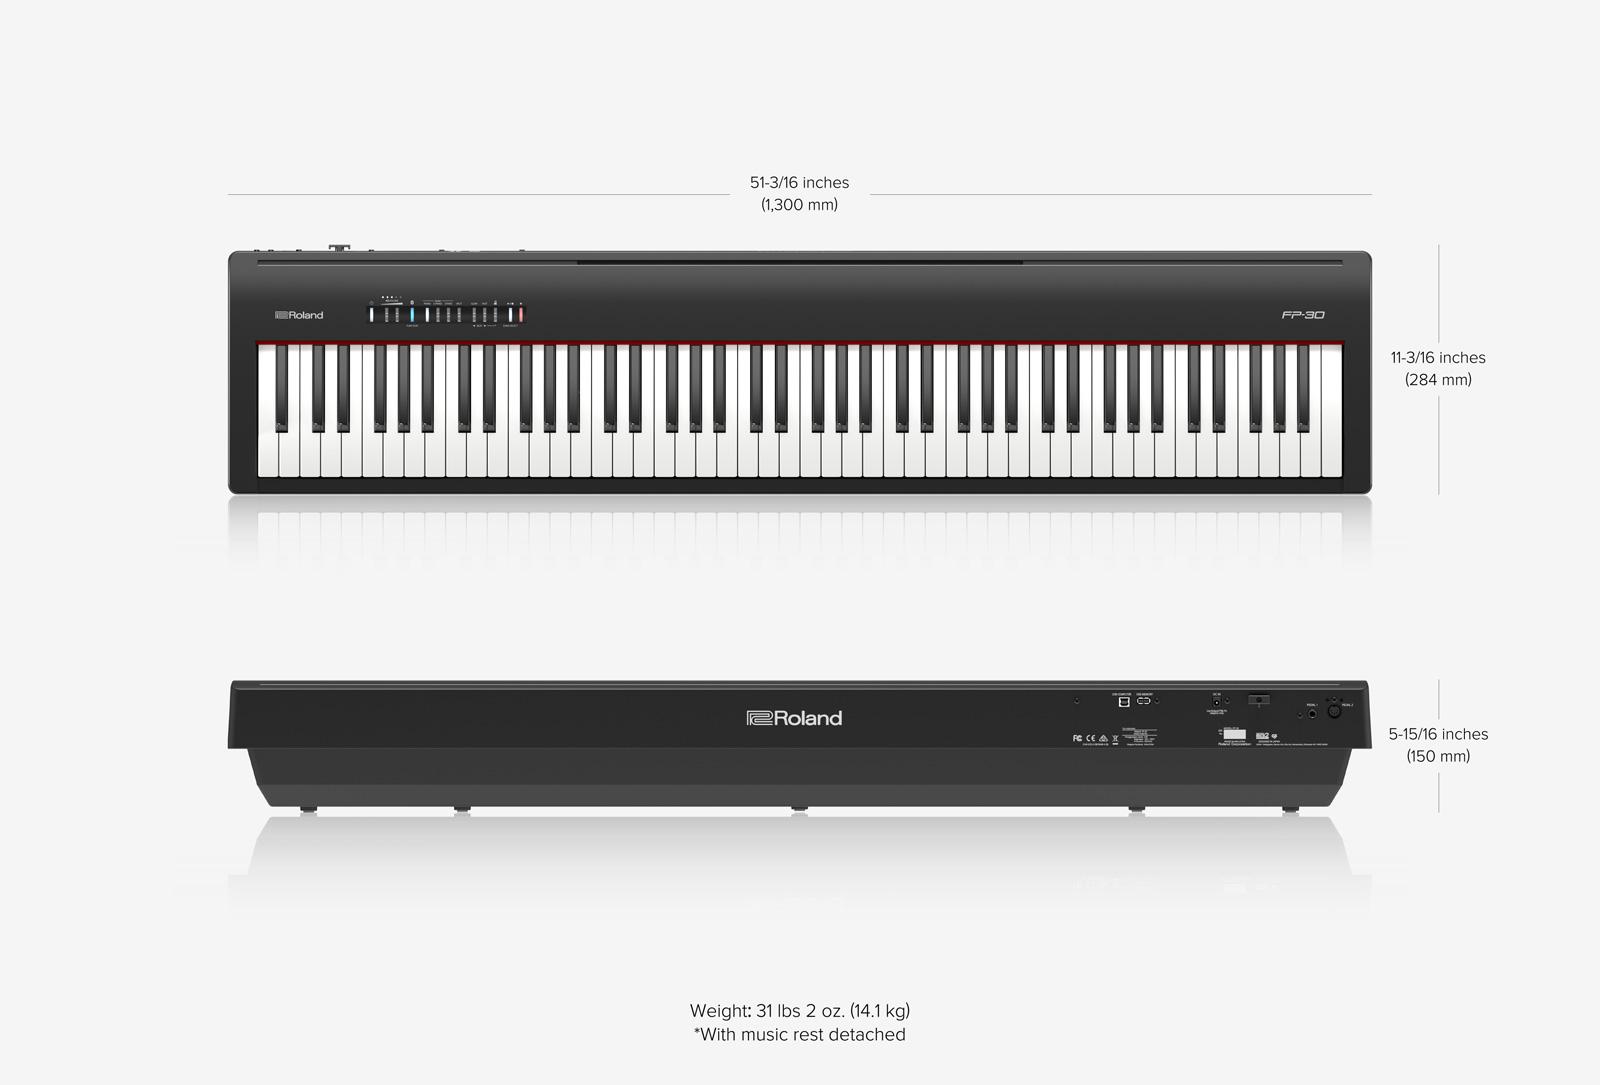 roland ep 70 digital piano manual digital photos and descriptions magimages org. Black Bedroom Furniture Sets. Home Design Ideas